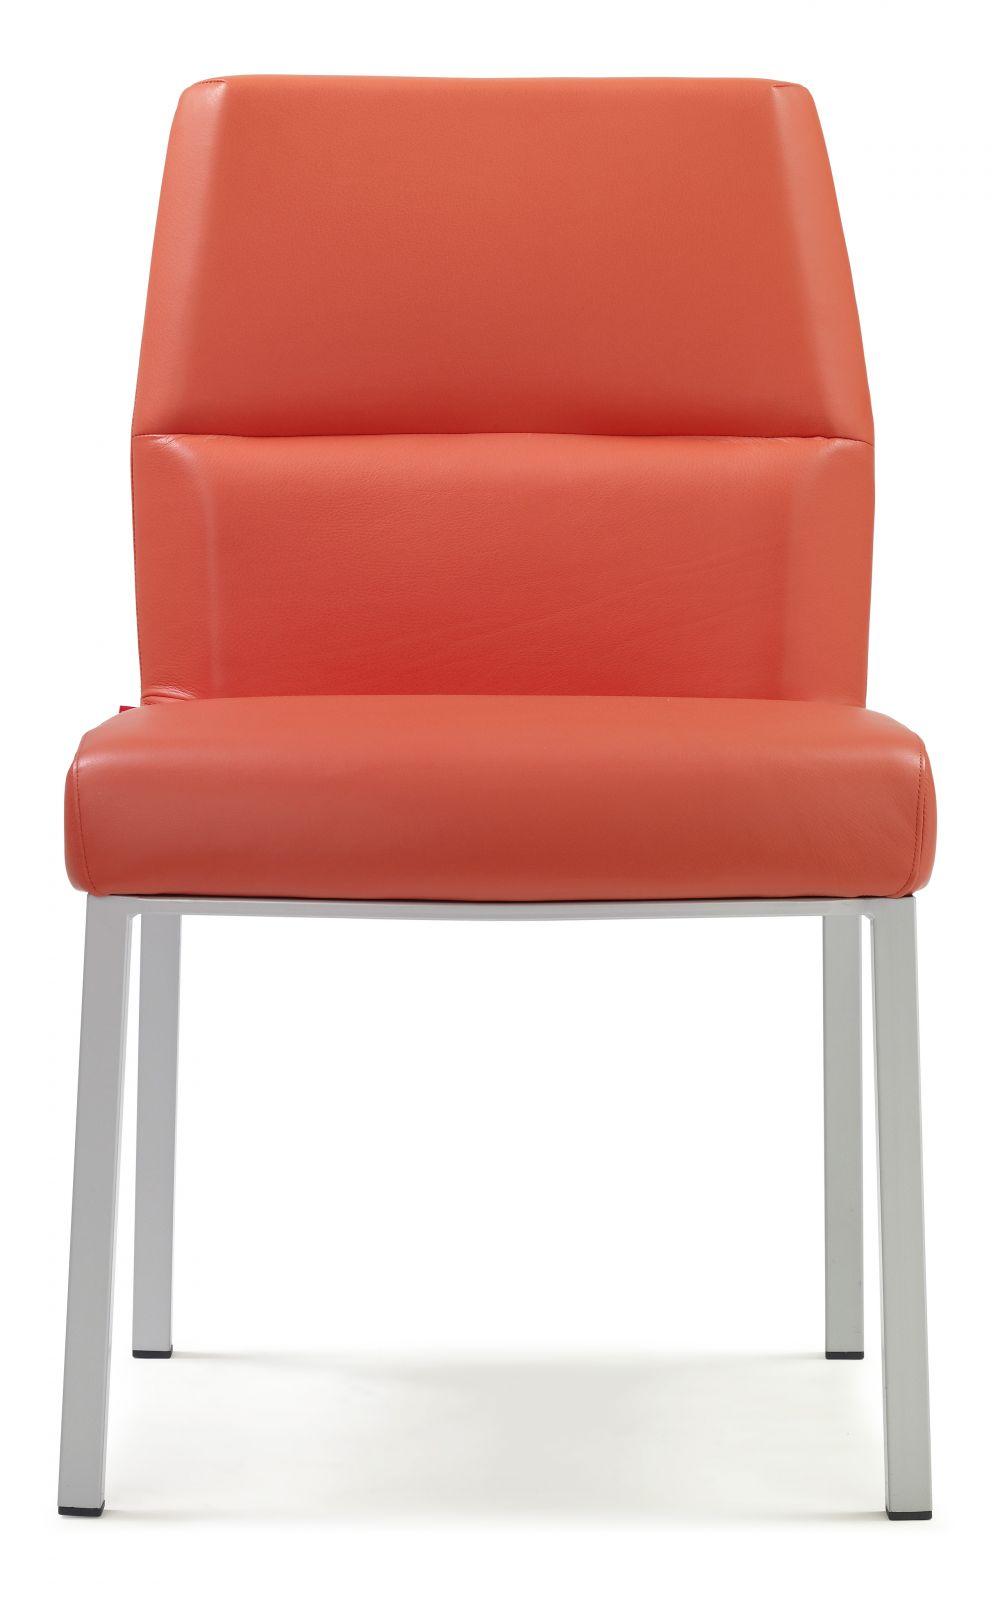 modern-office-furniture-chairs-Italian-designer-furniture (41).jpg